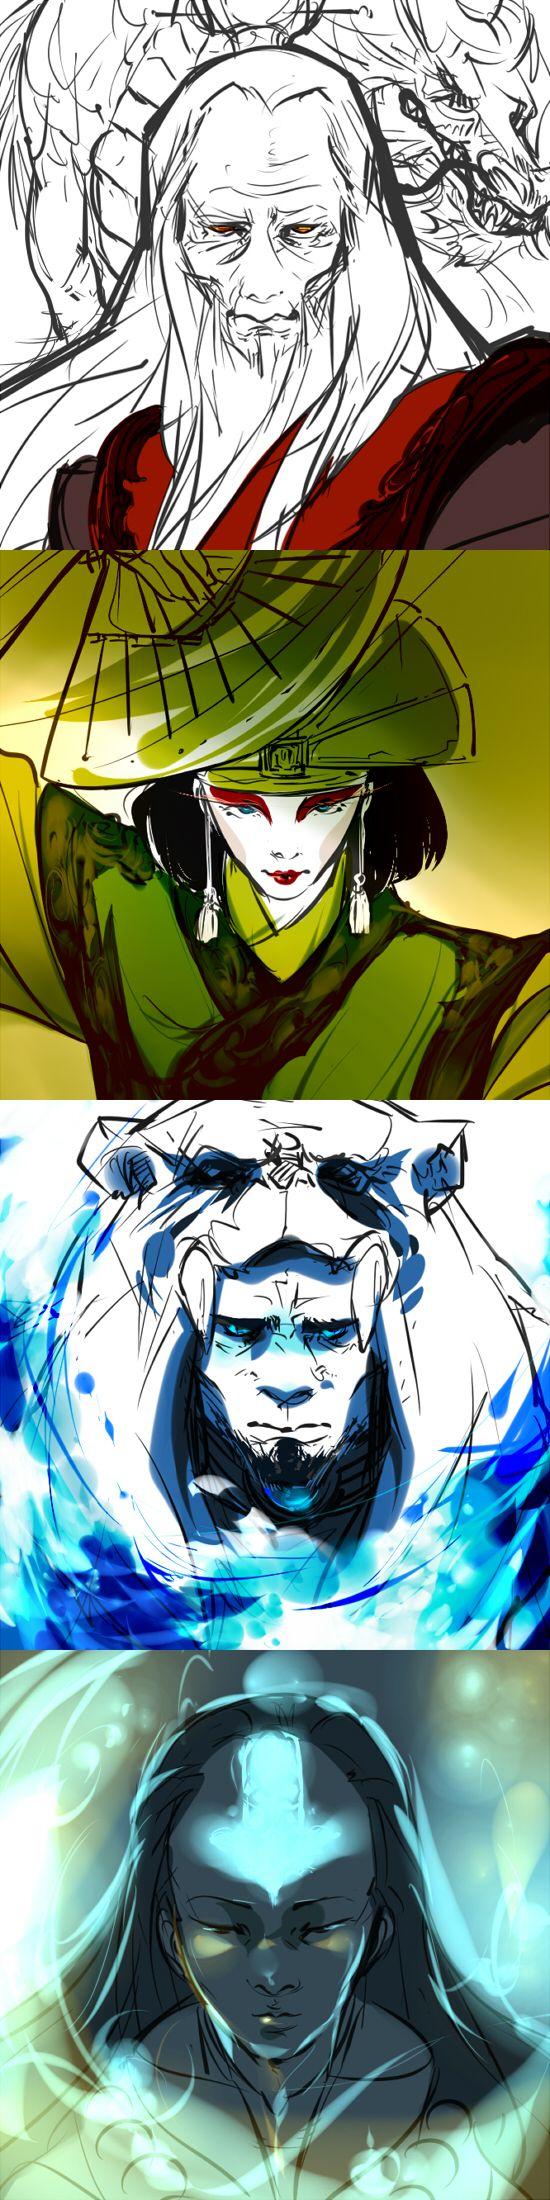 The Avatars | by VirusGarura on deviantART | The Last Airbender | Legend of Korra | Avatar